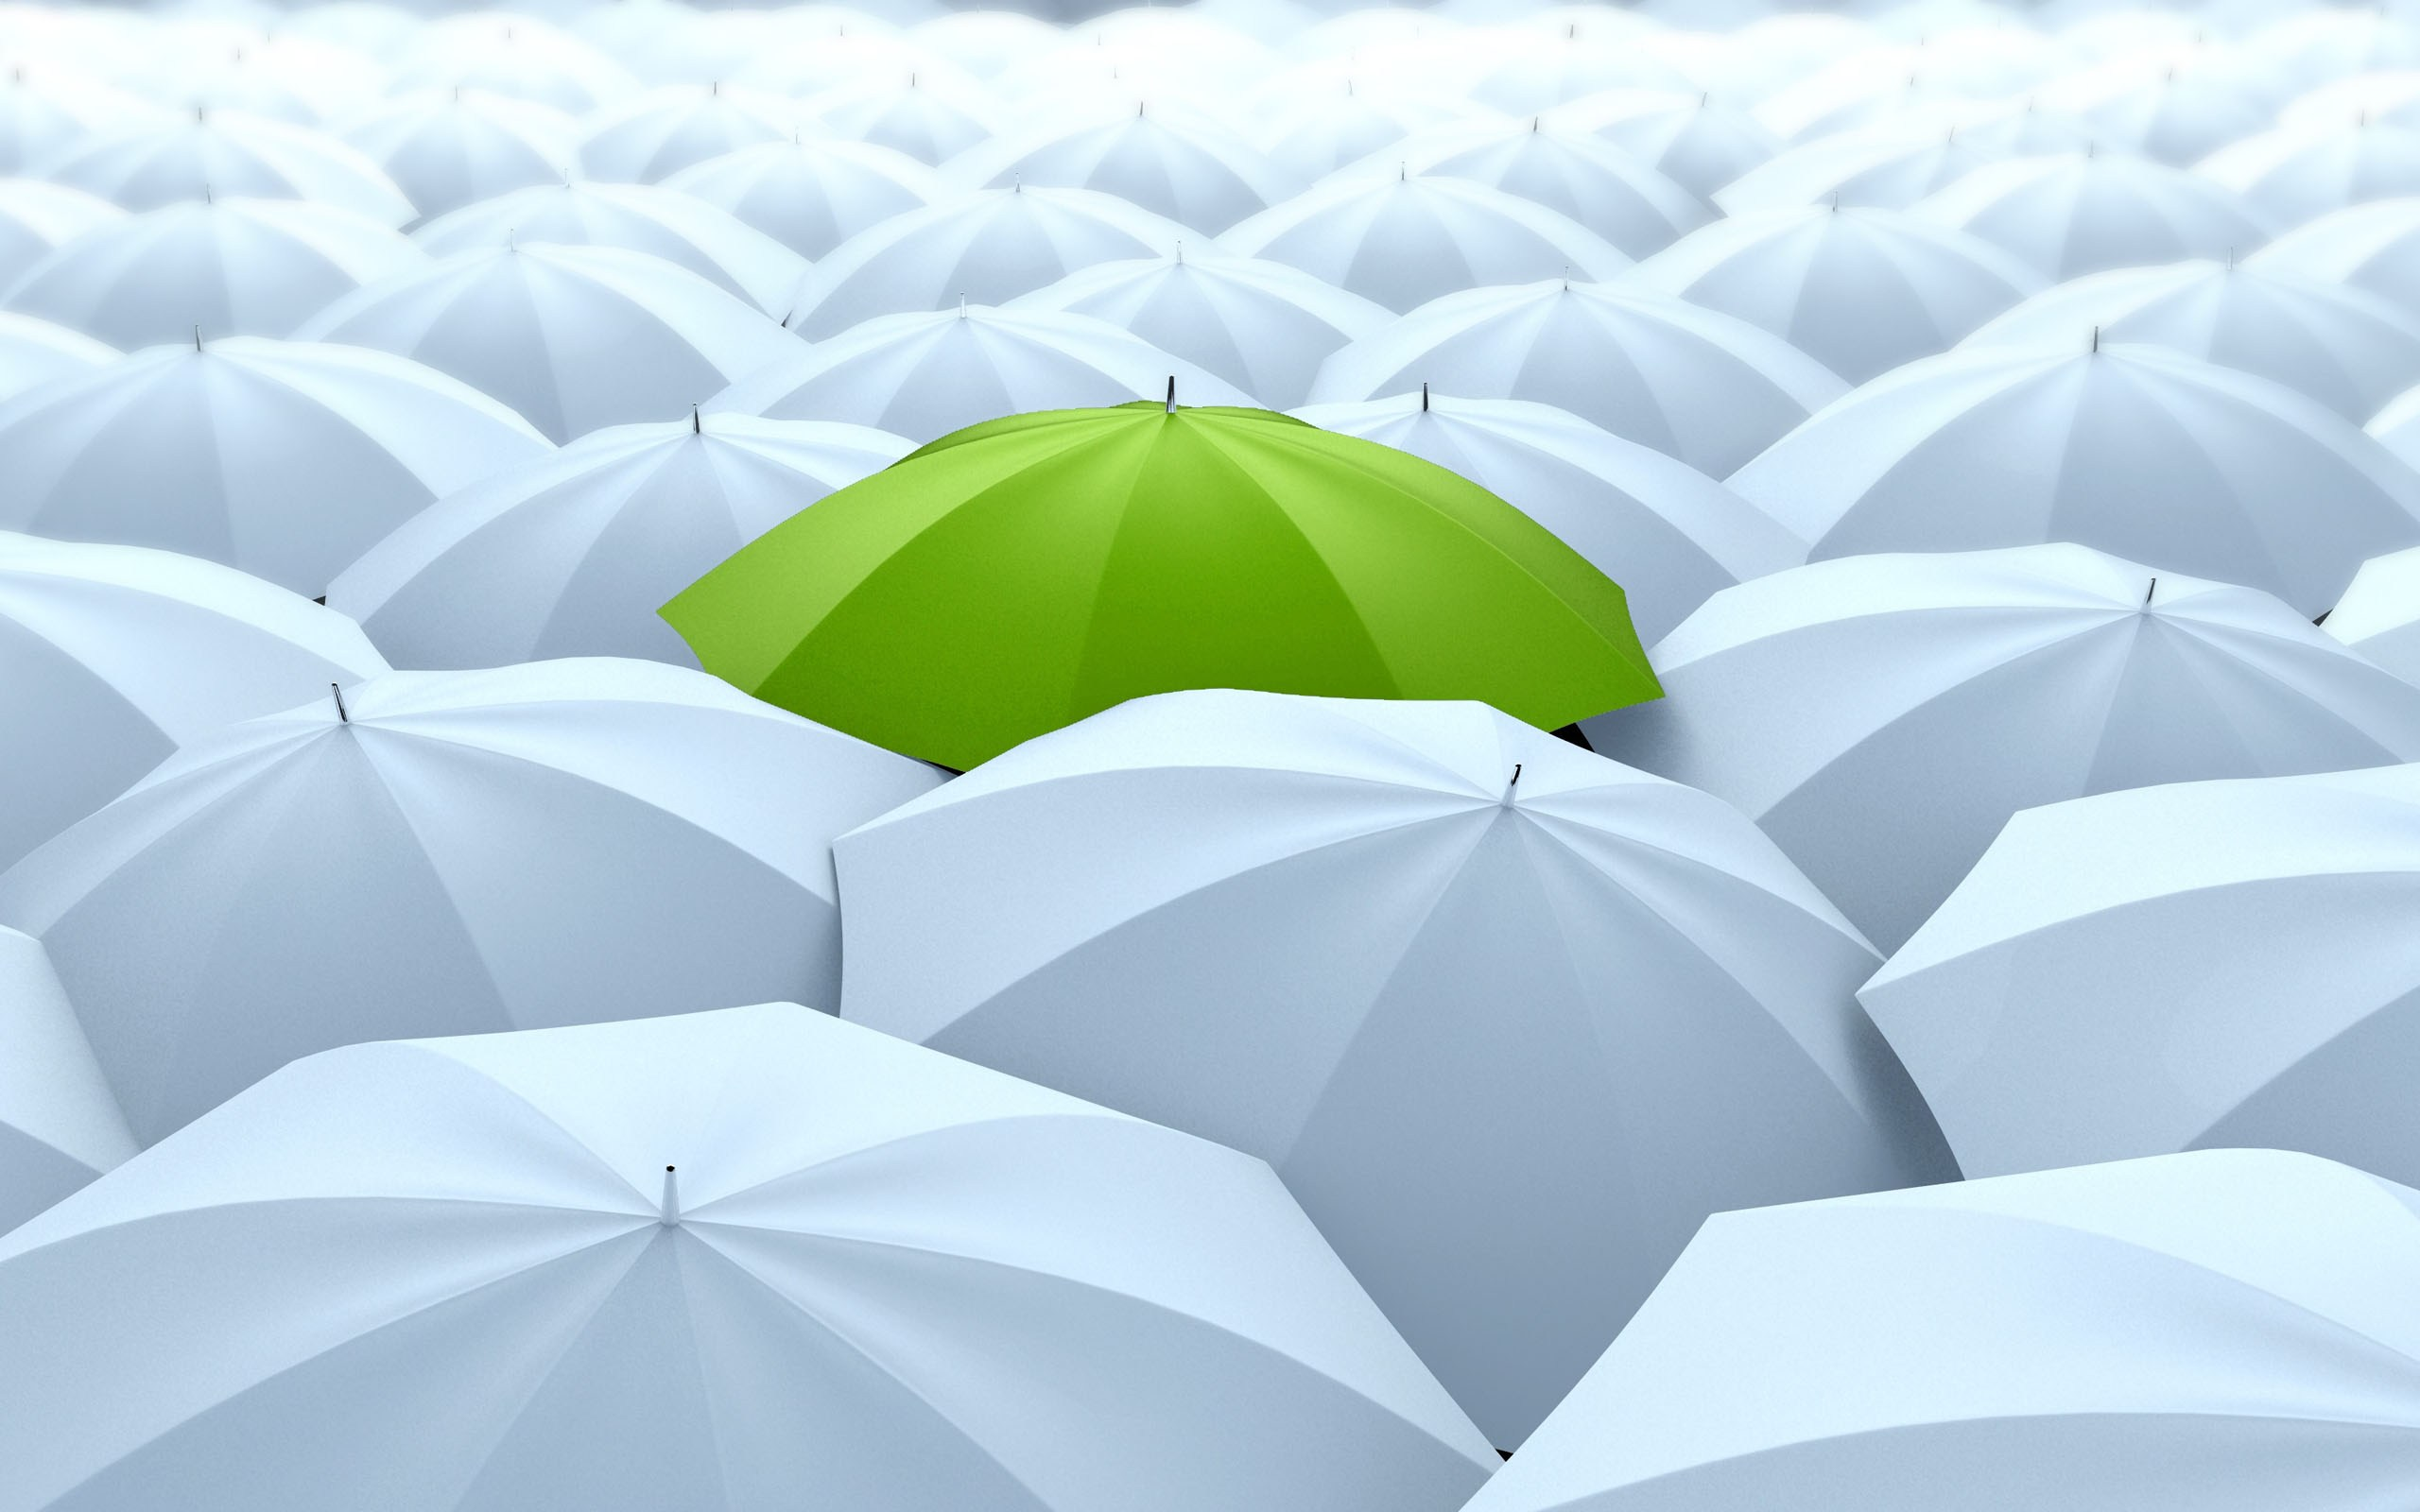 Many umbrellas. One green.